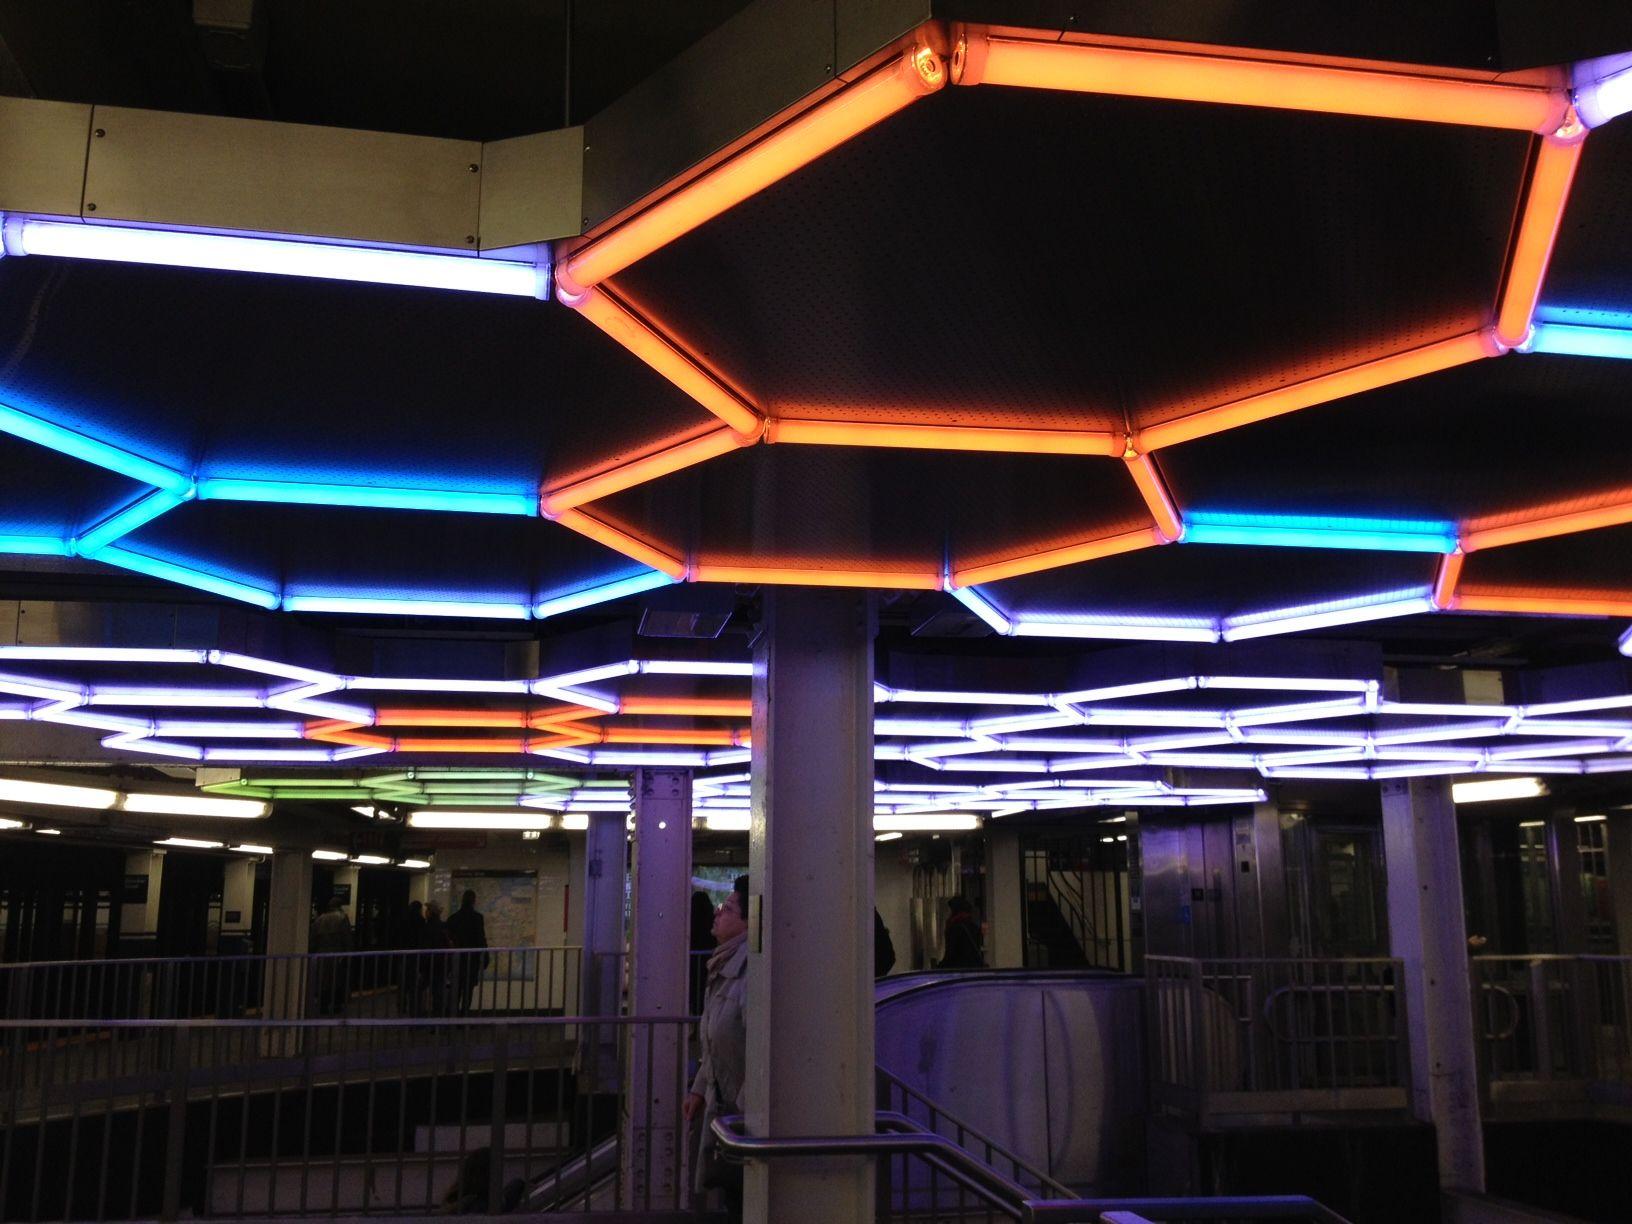 Leo Villareal, Hive (Bleeker Street), LED tubes, custom software, electrical hardware, aluminum, stainless steel, 2012.